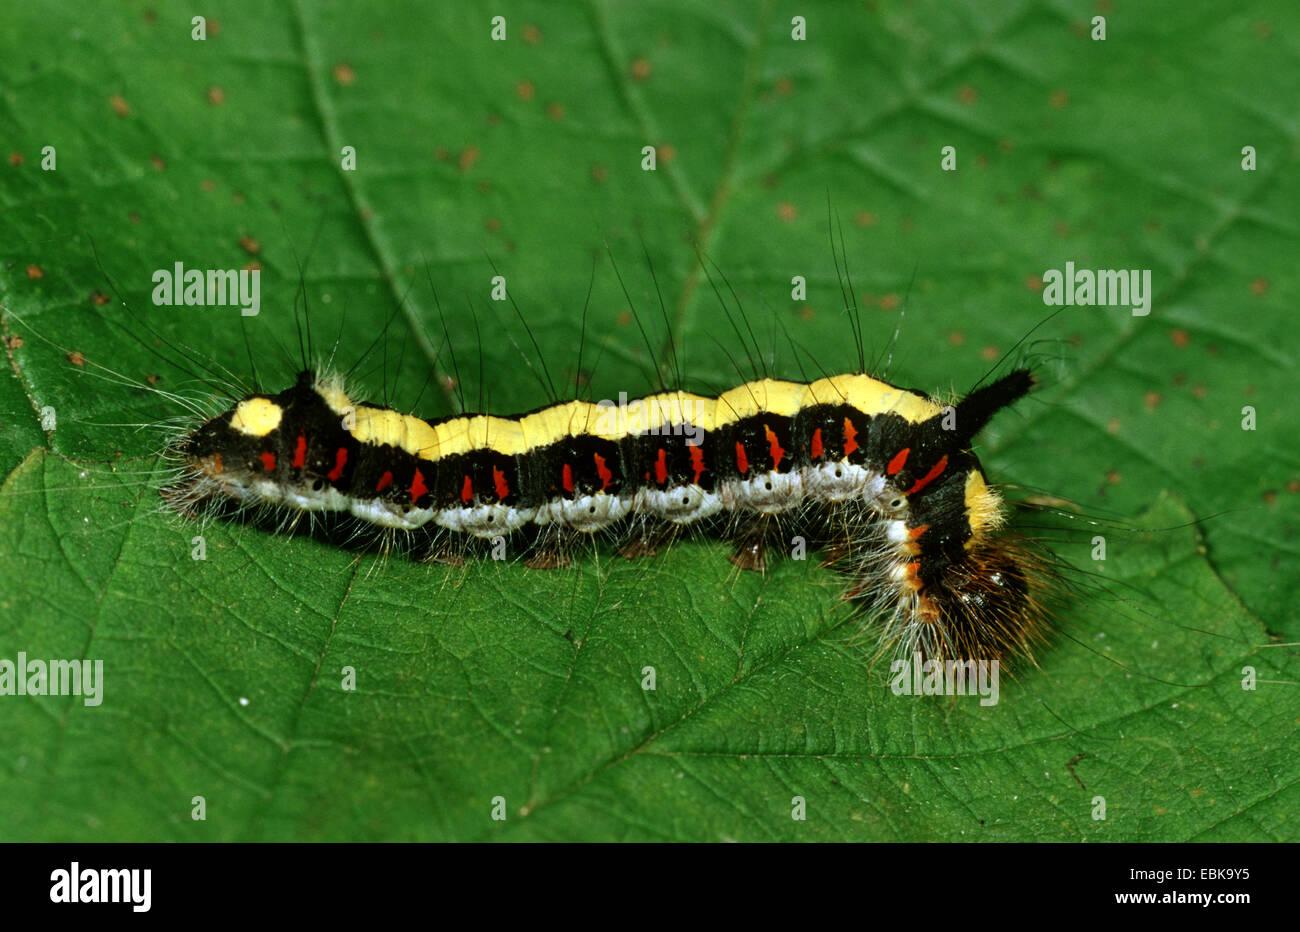 grey dagger (Acronicta psi), caterpillar on leaf, Germany - Stock Image